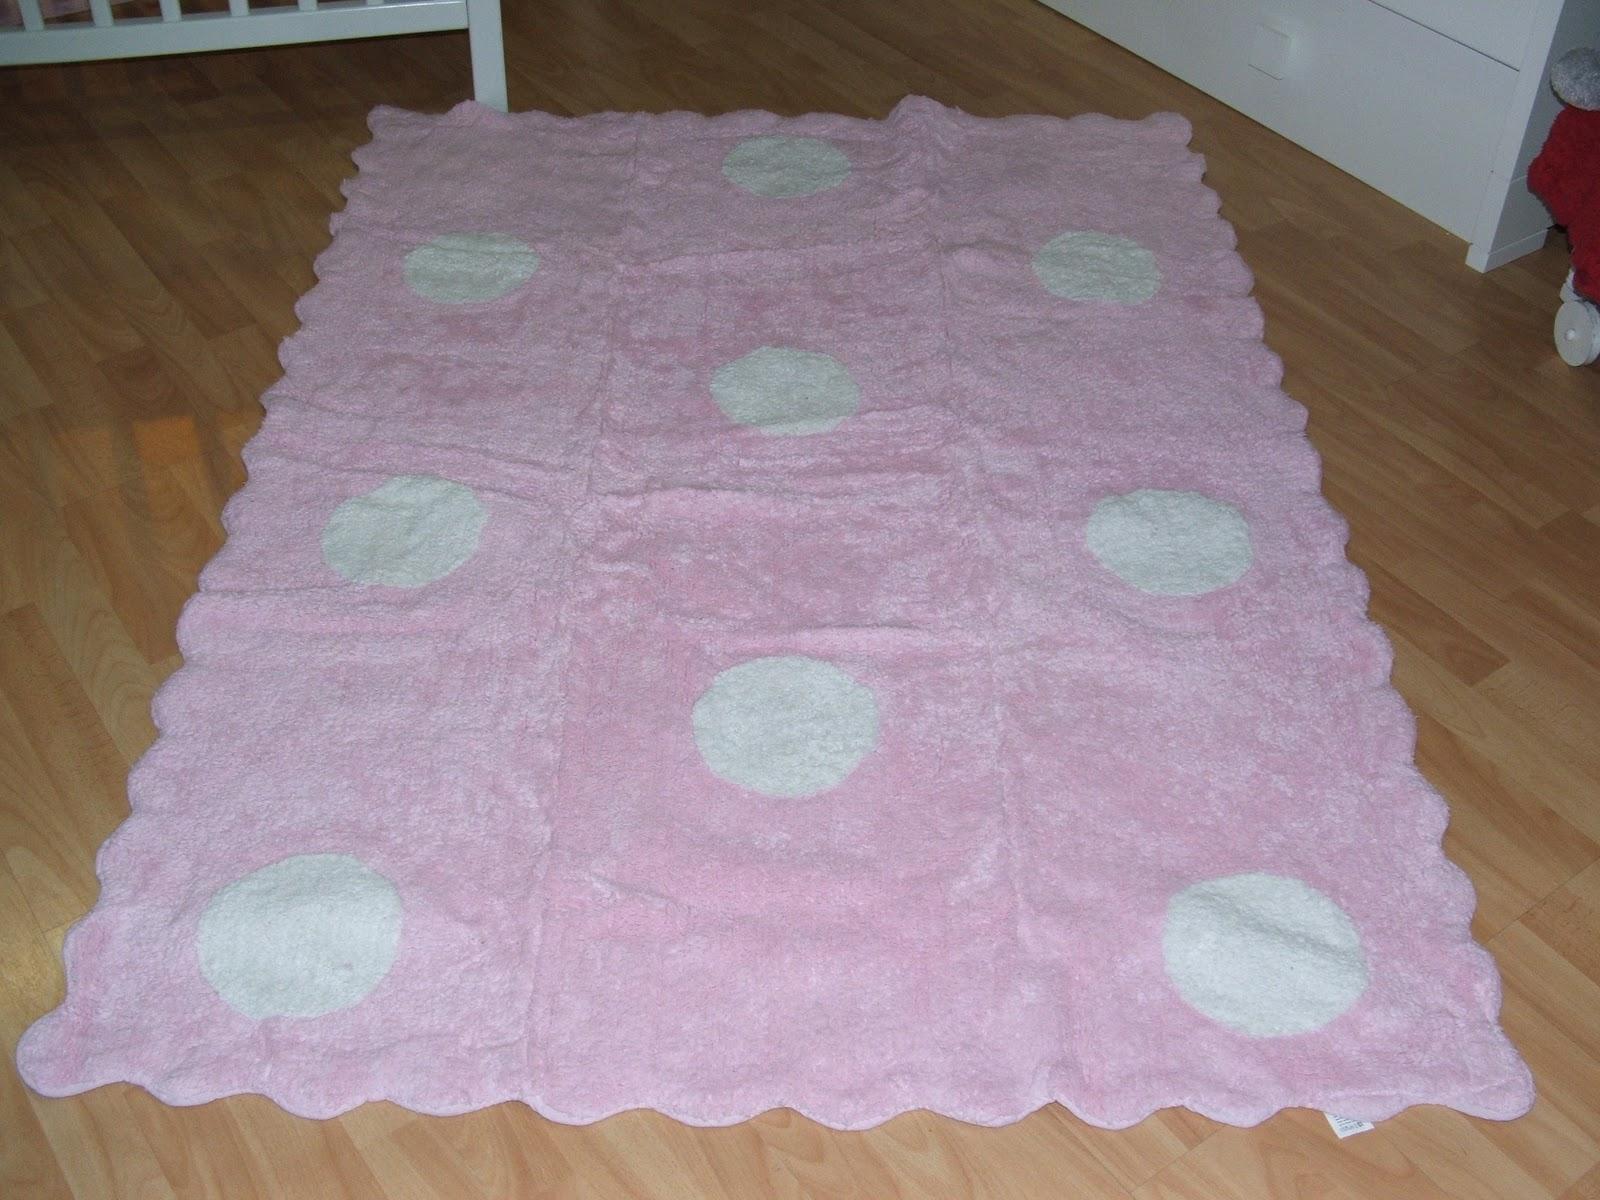 Luna lunera alfombras de algod n - Alfombras de algodon ...